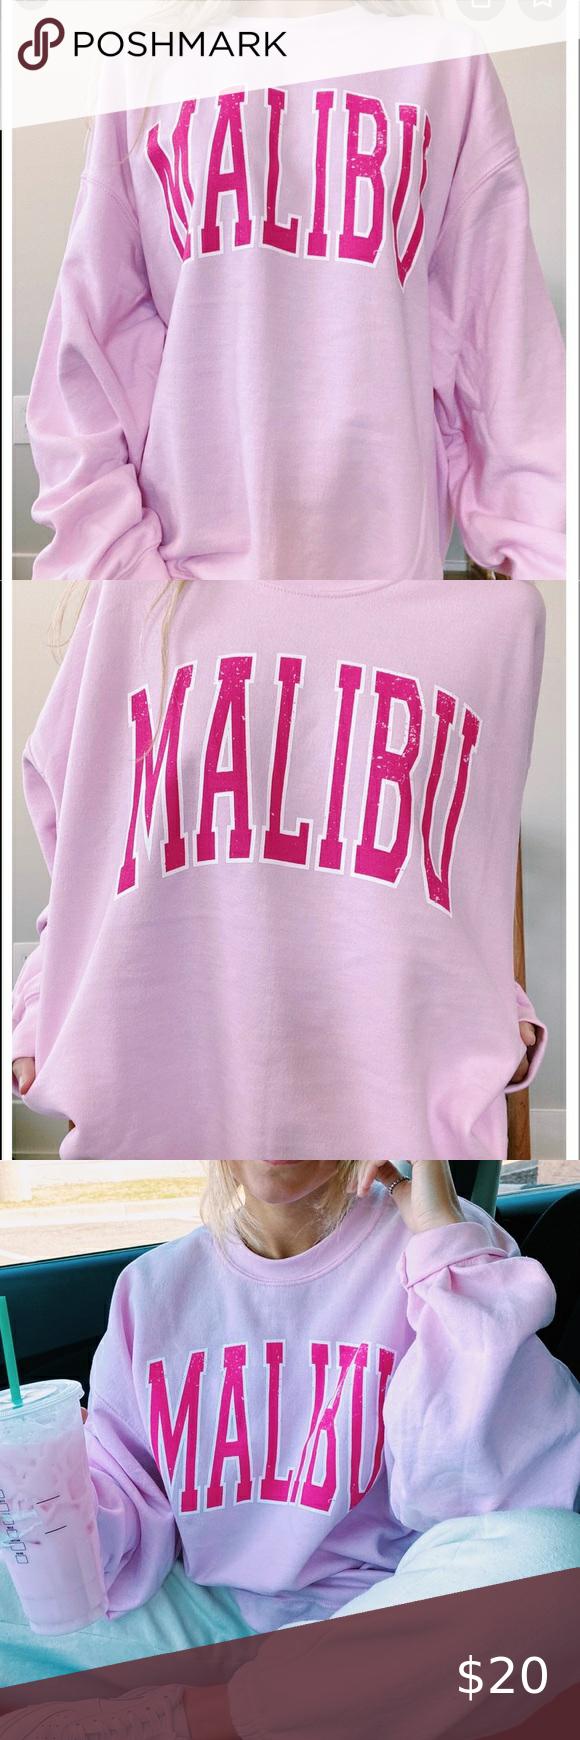 Nwt Women S Malibu Crewneck Sweatshirt Pink Nwt Pink Malibu Crewneck Ordered From Sunnygless Never Worn Crew Neck Sweatshirt Pink Sweatshirt Sweatshirts [ 1740 x 580 Pixel ]